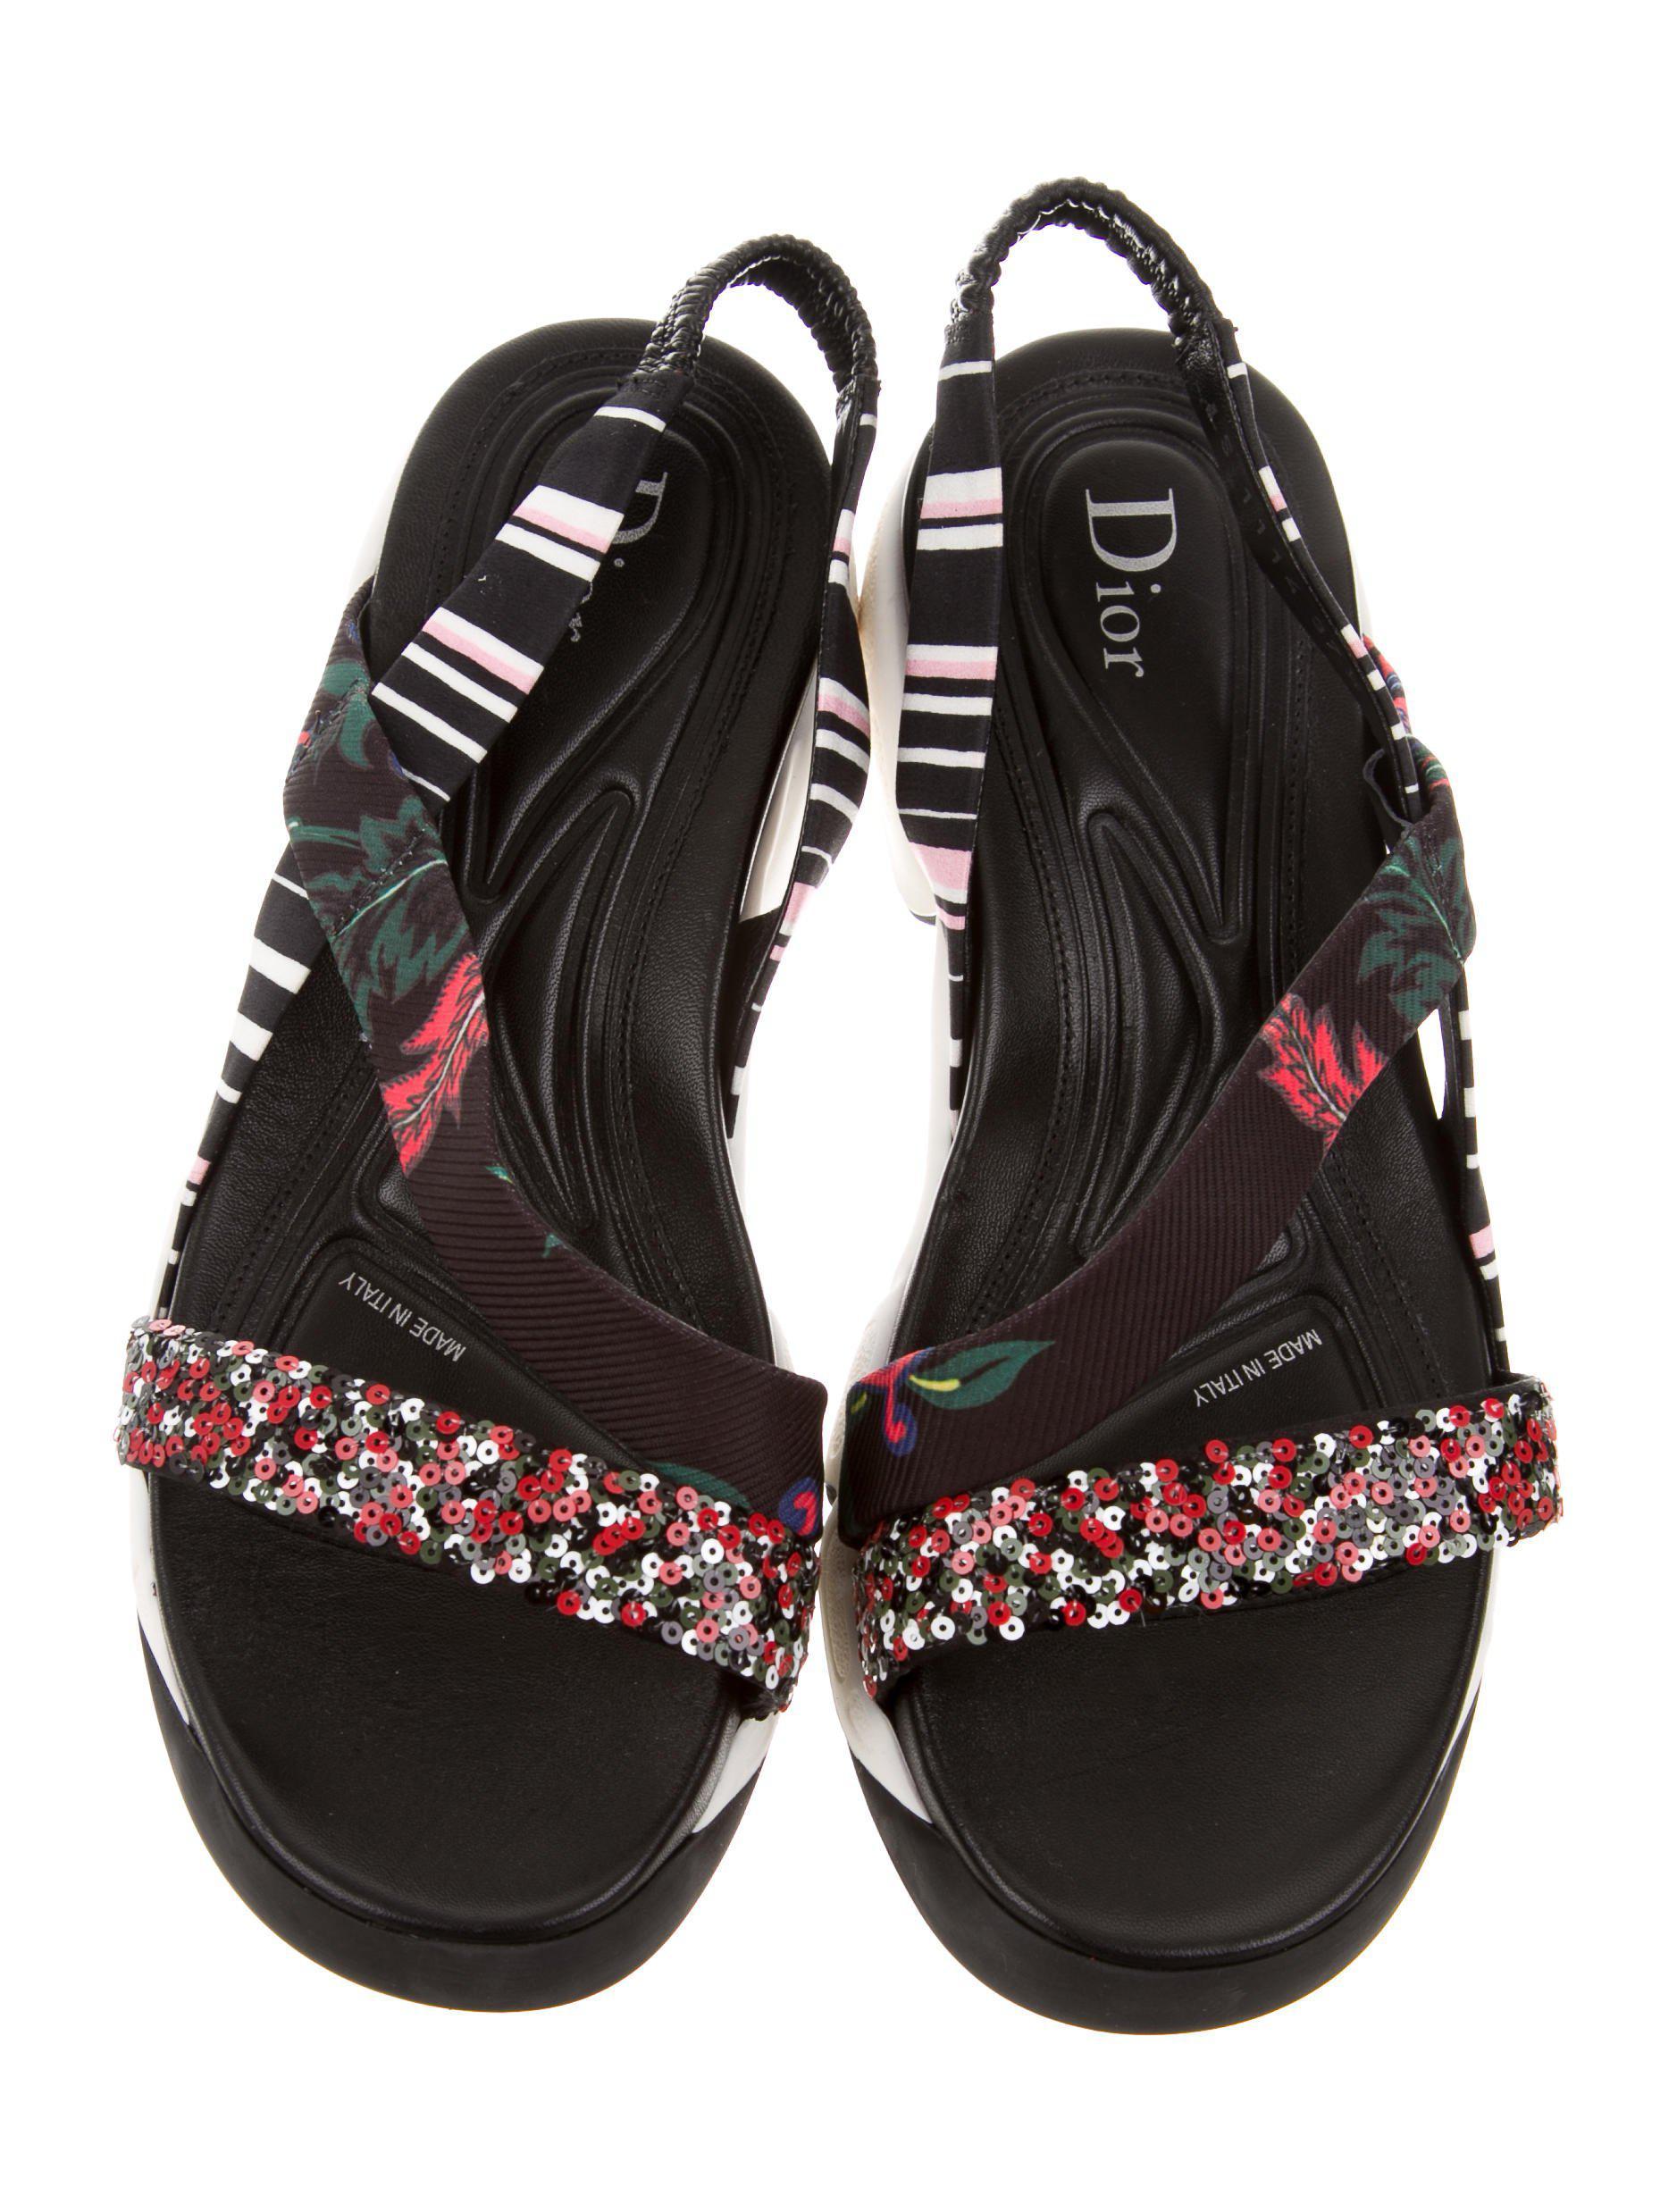 Lyst Dior Sequin Slingback Sandals In Black